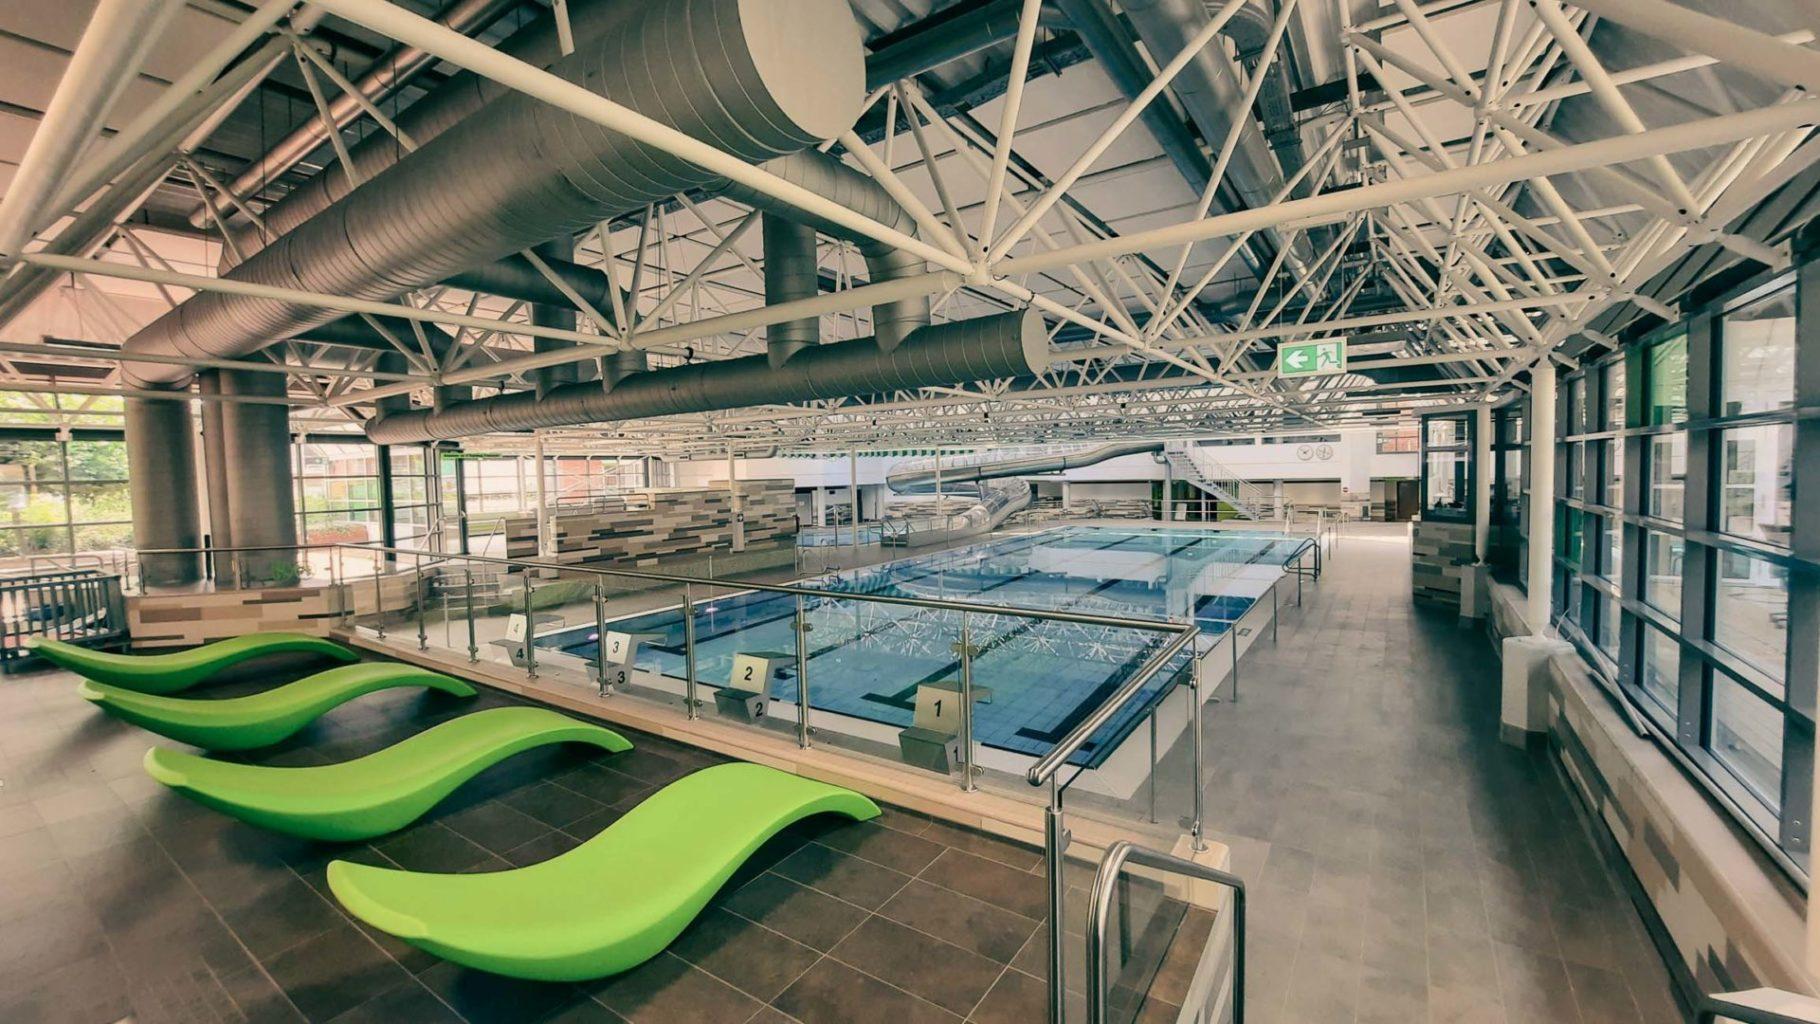 Hallenbad Kinderhaus öffnet Sonntag